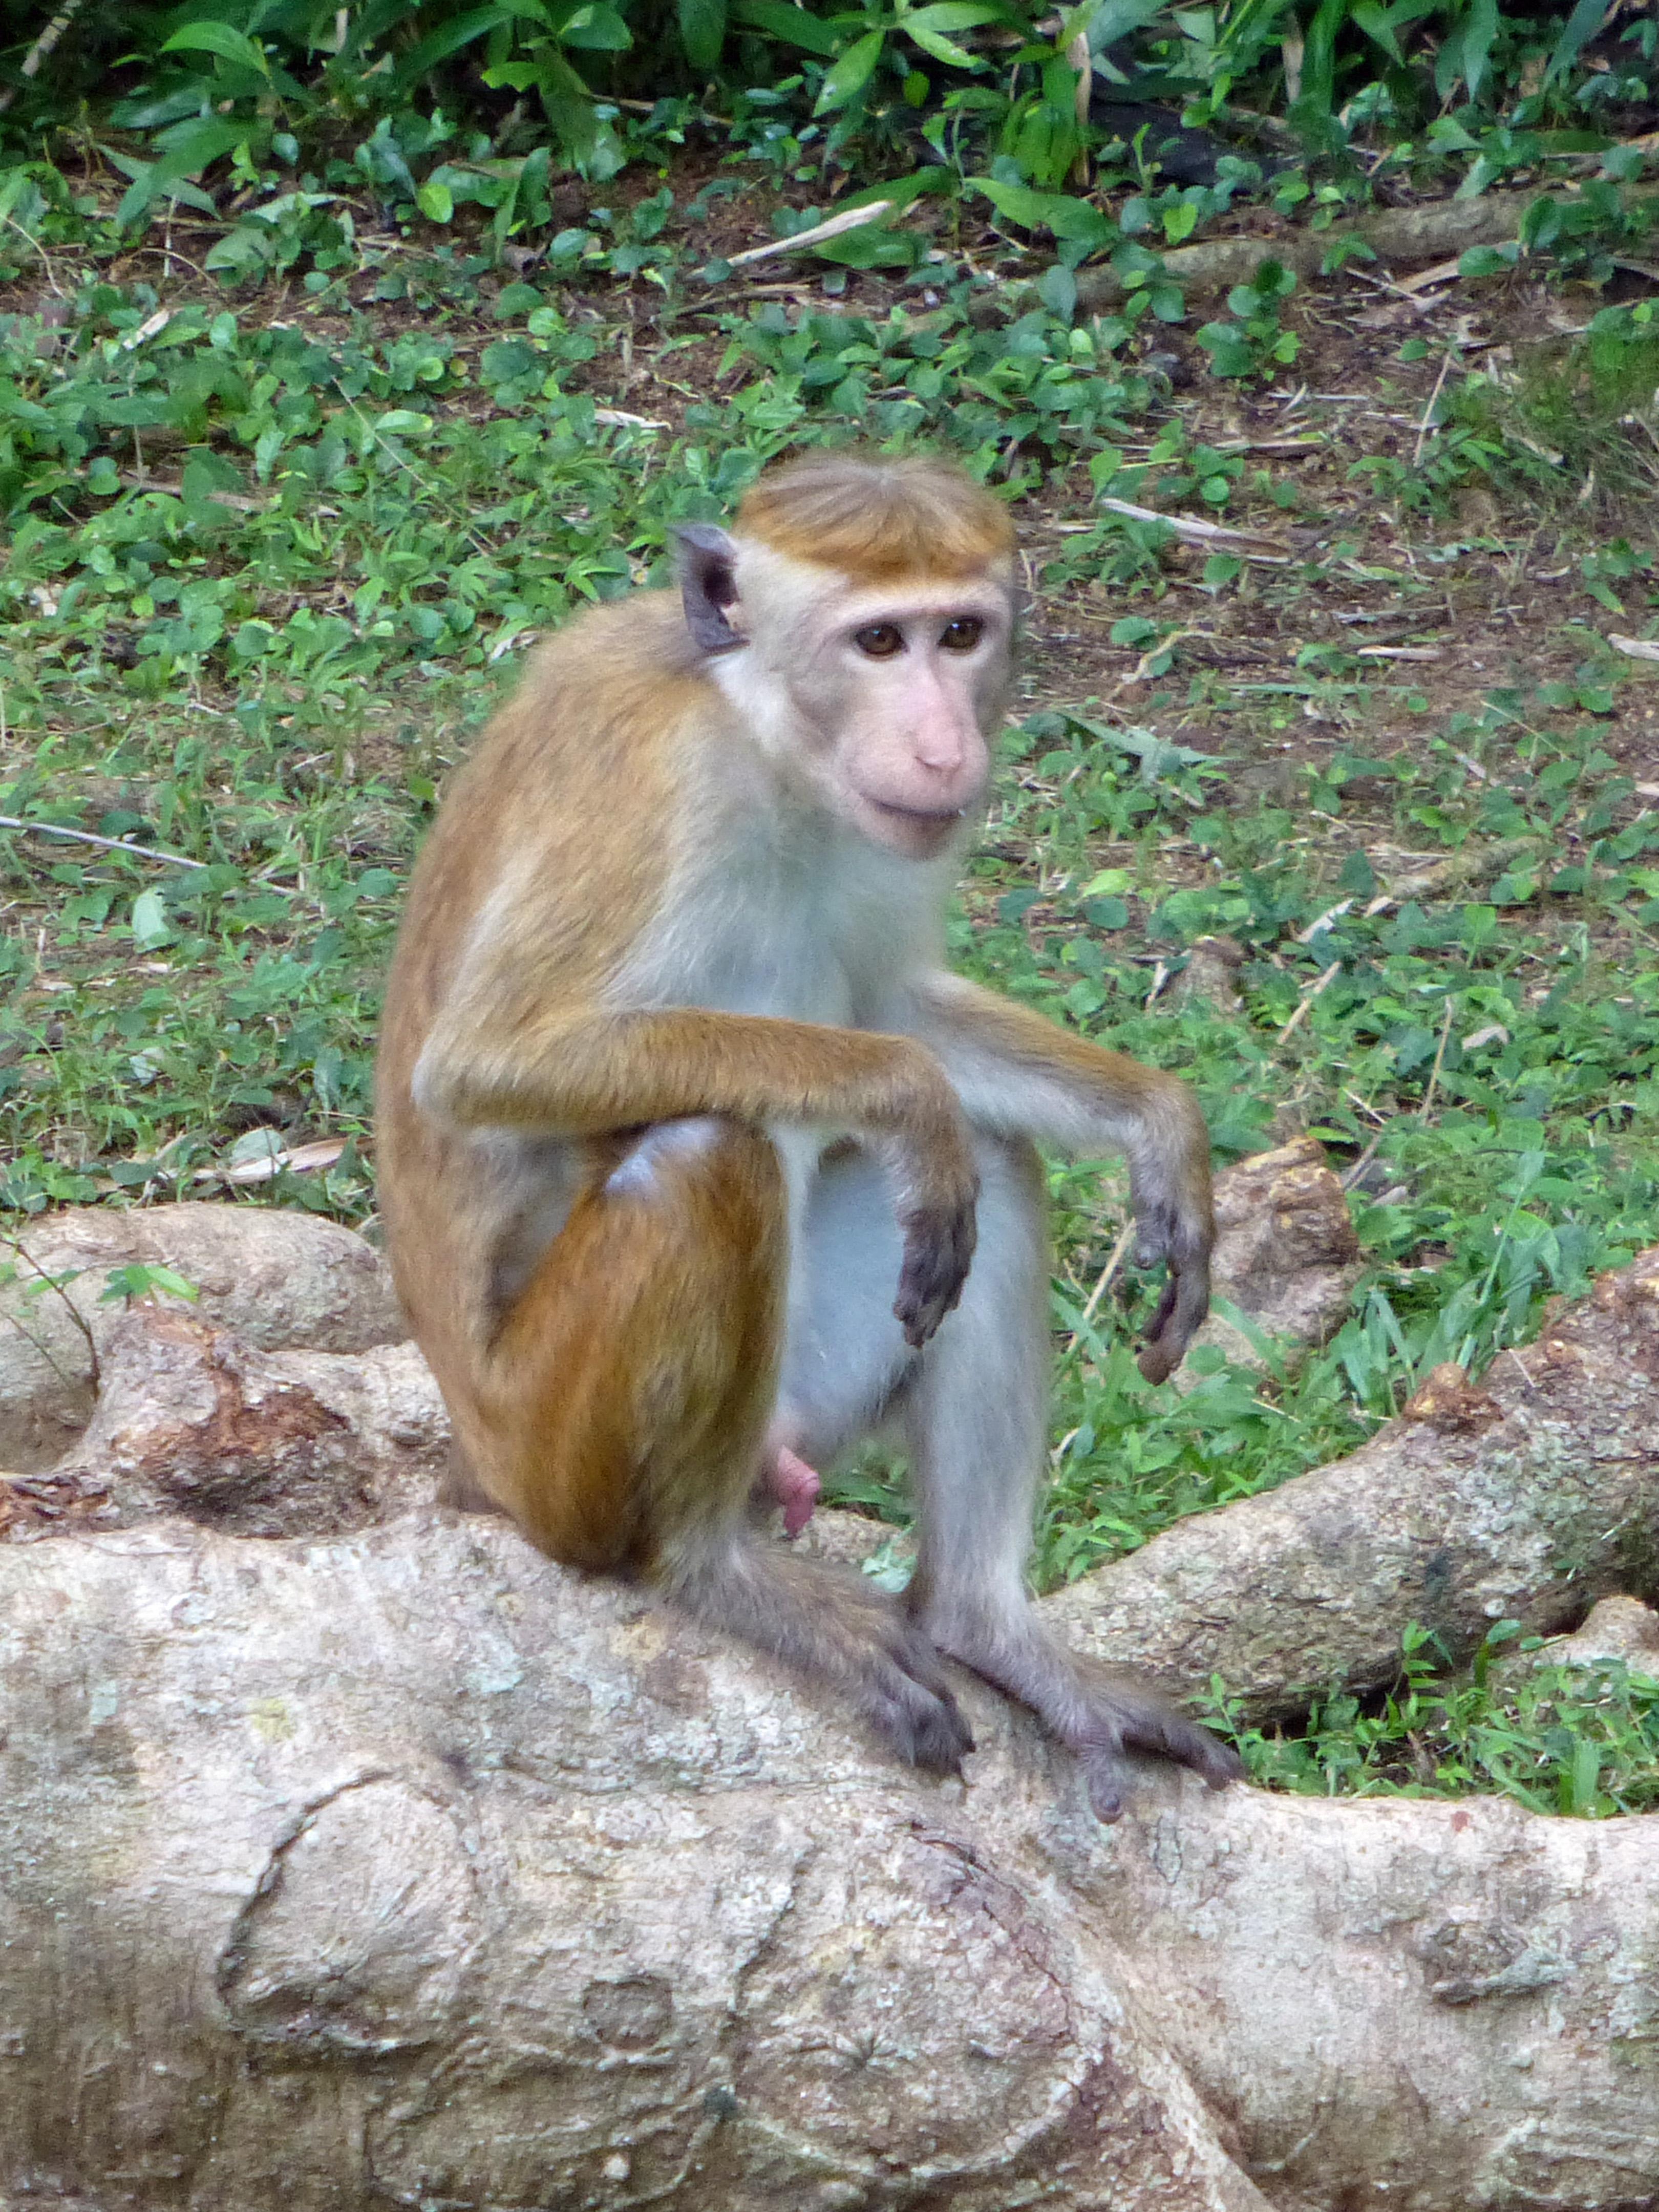 Macaca_sinica-Sigiriya_Village-Sri_Lanka_(3)